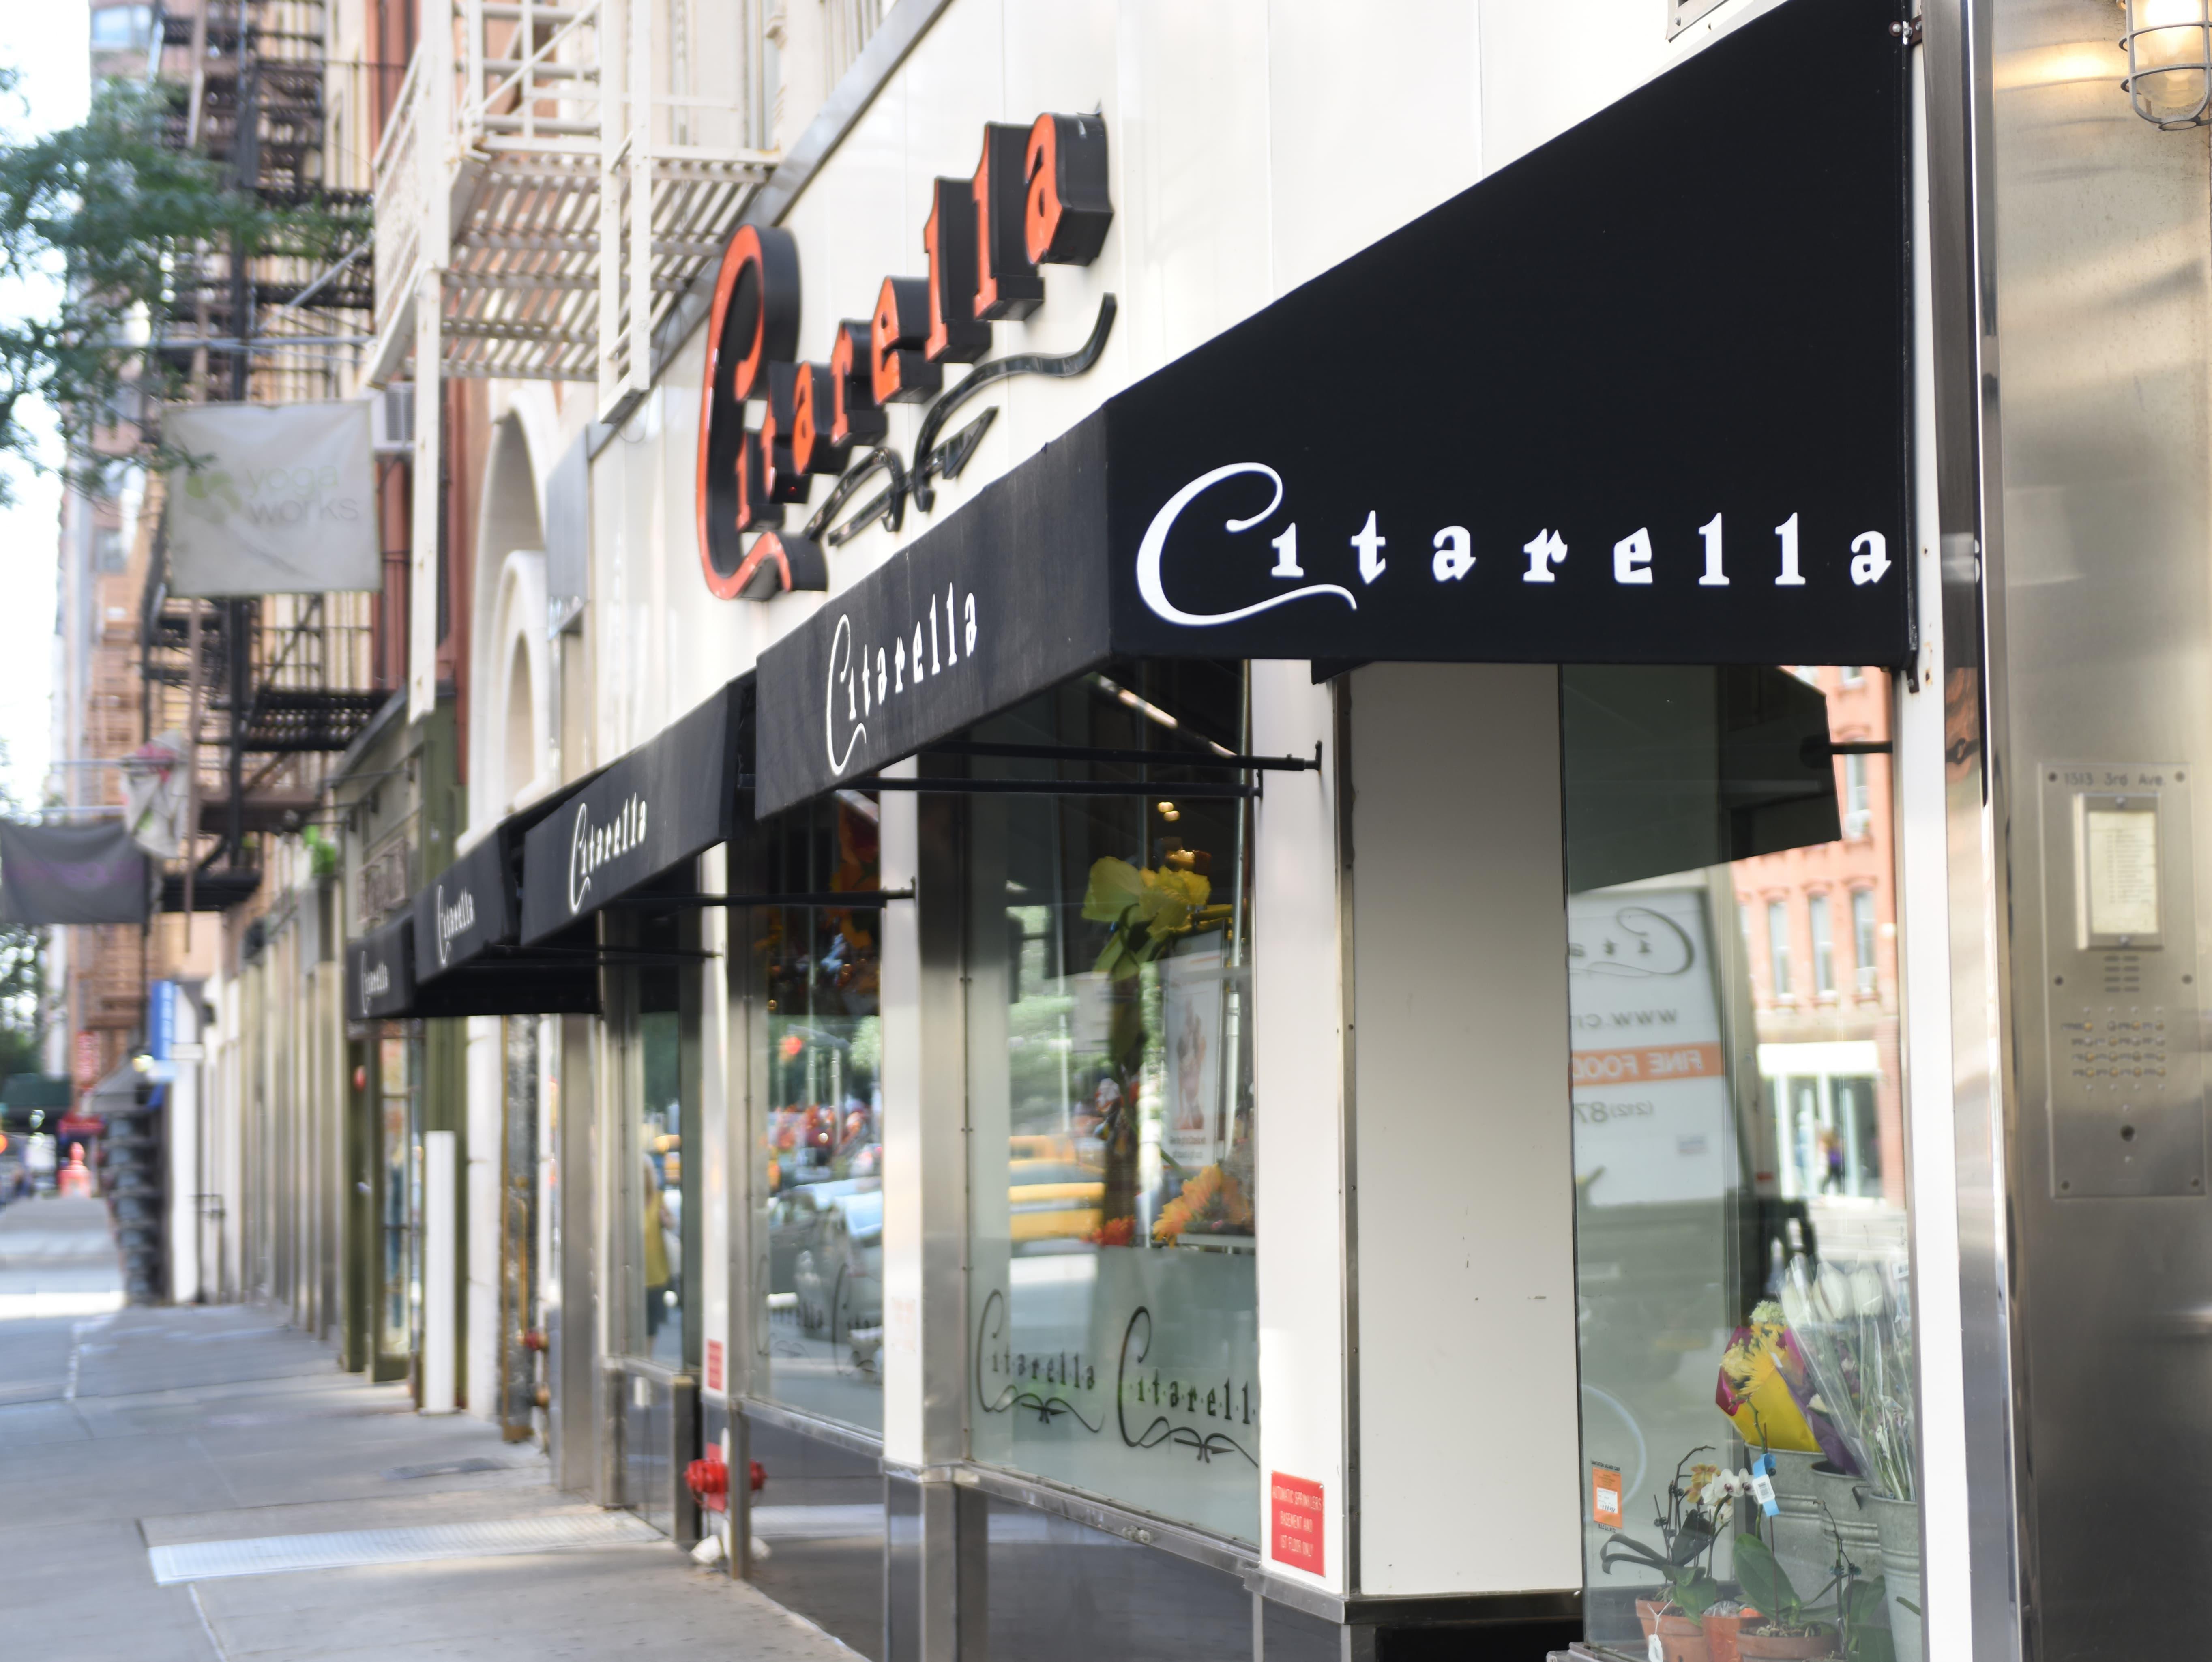 Citarella Gourmet Market - Upper East Side image 14